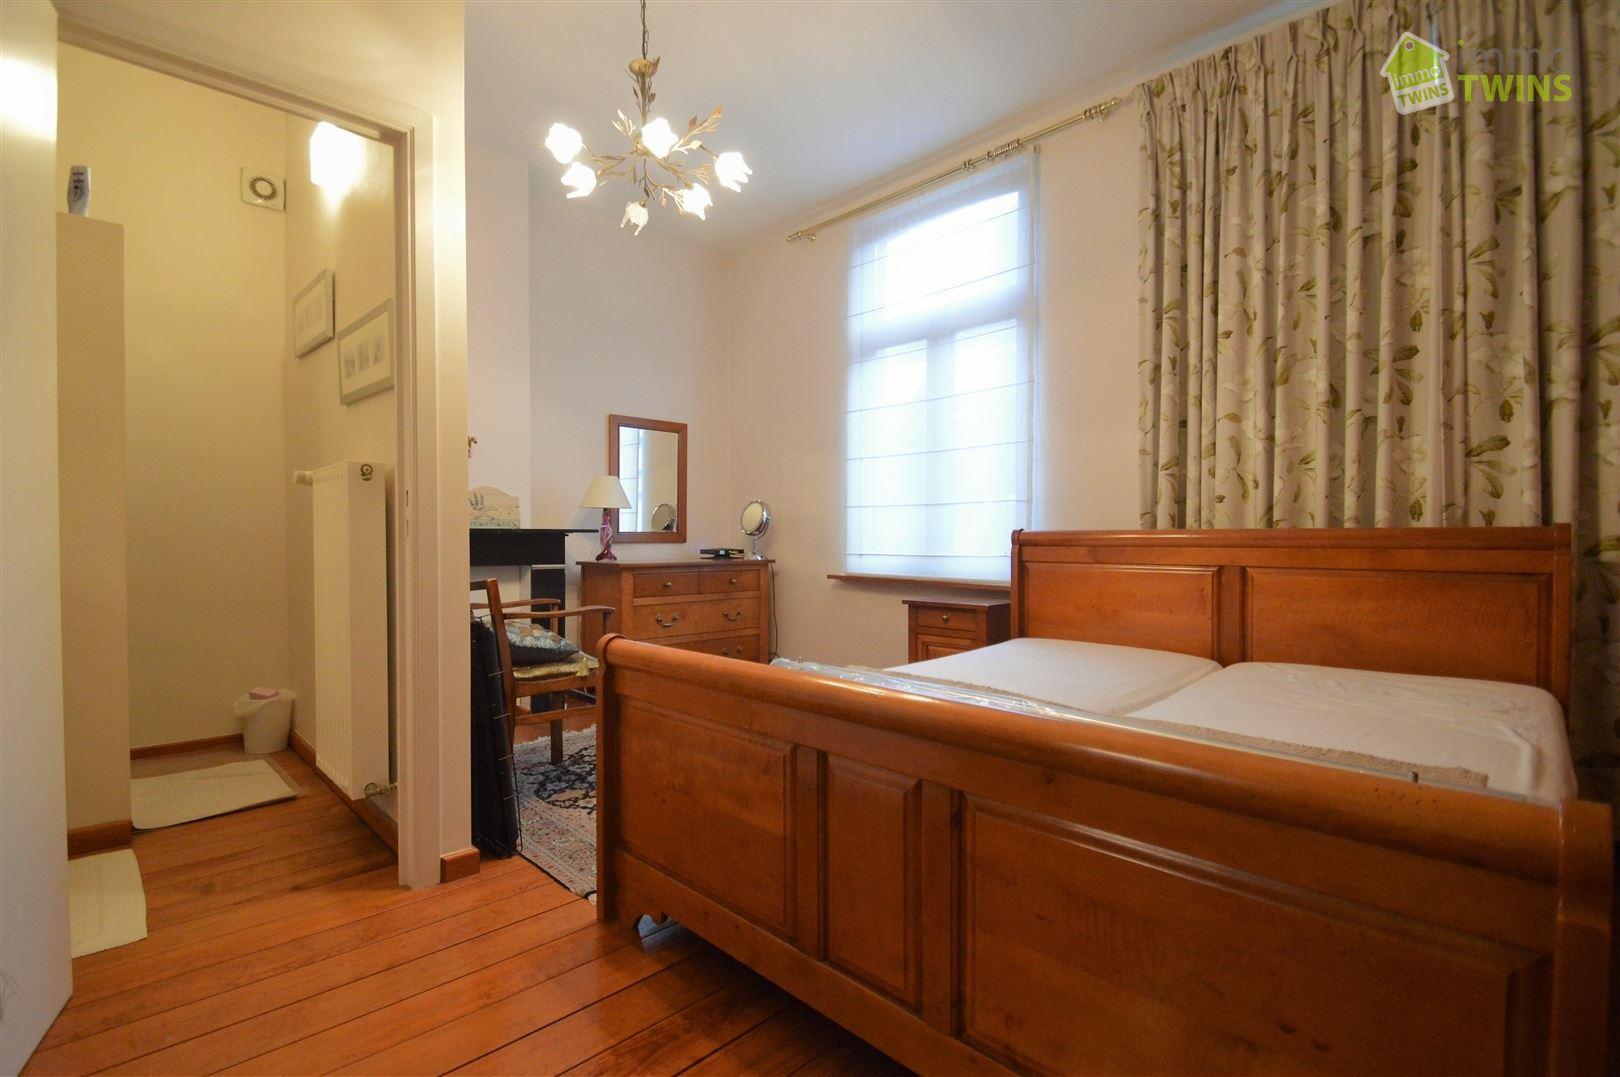 Foto 13 : Duplex/Penthouse te 2890 SINT-AMANDS (België) - Prijs € 429.000